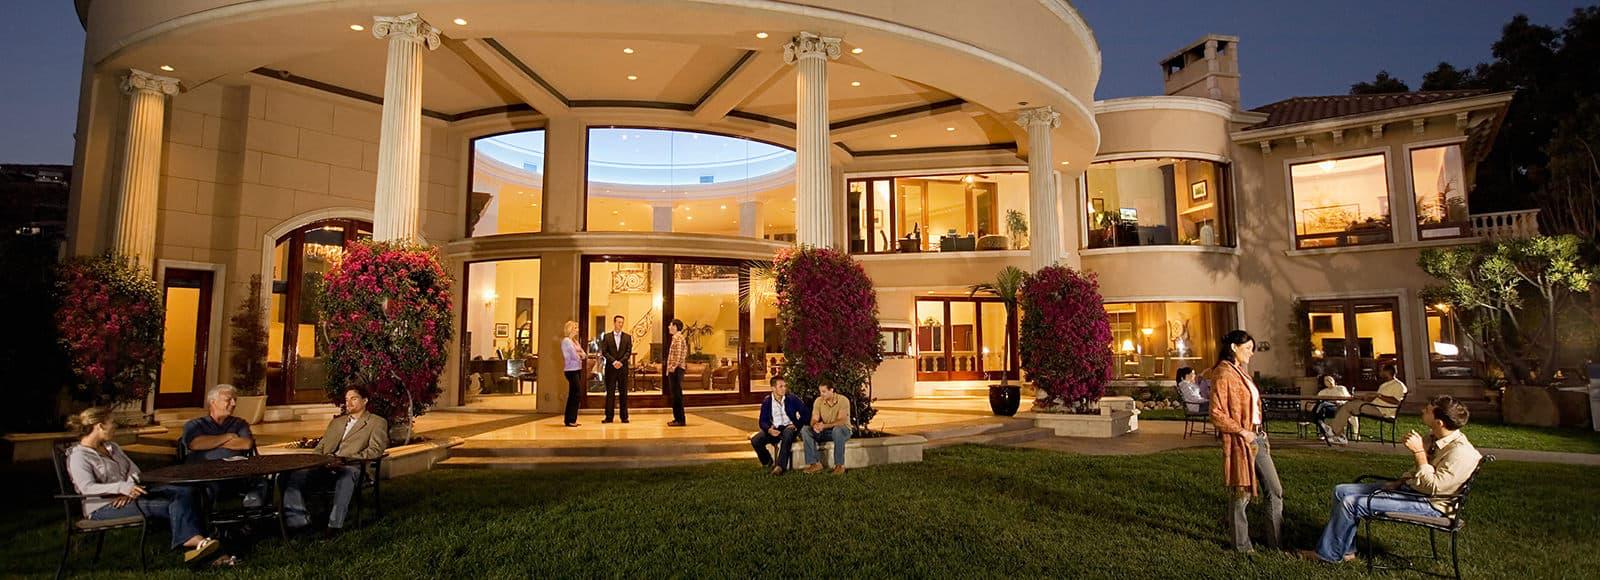 Luxury Rehab Center